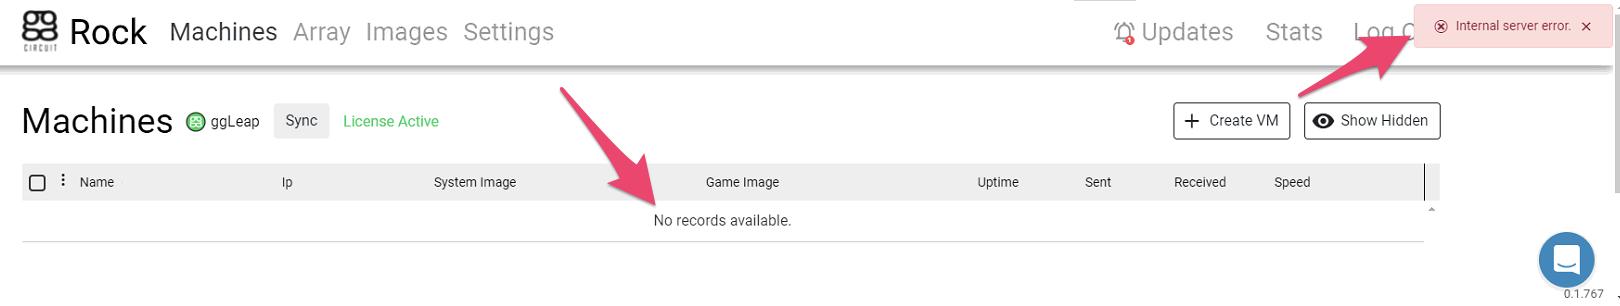 ggRock Machines Tab, No records available, Internal Server Error